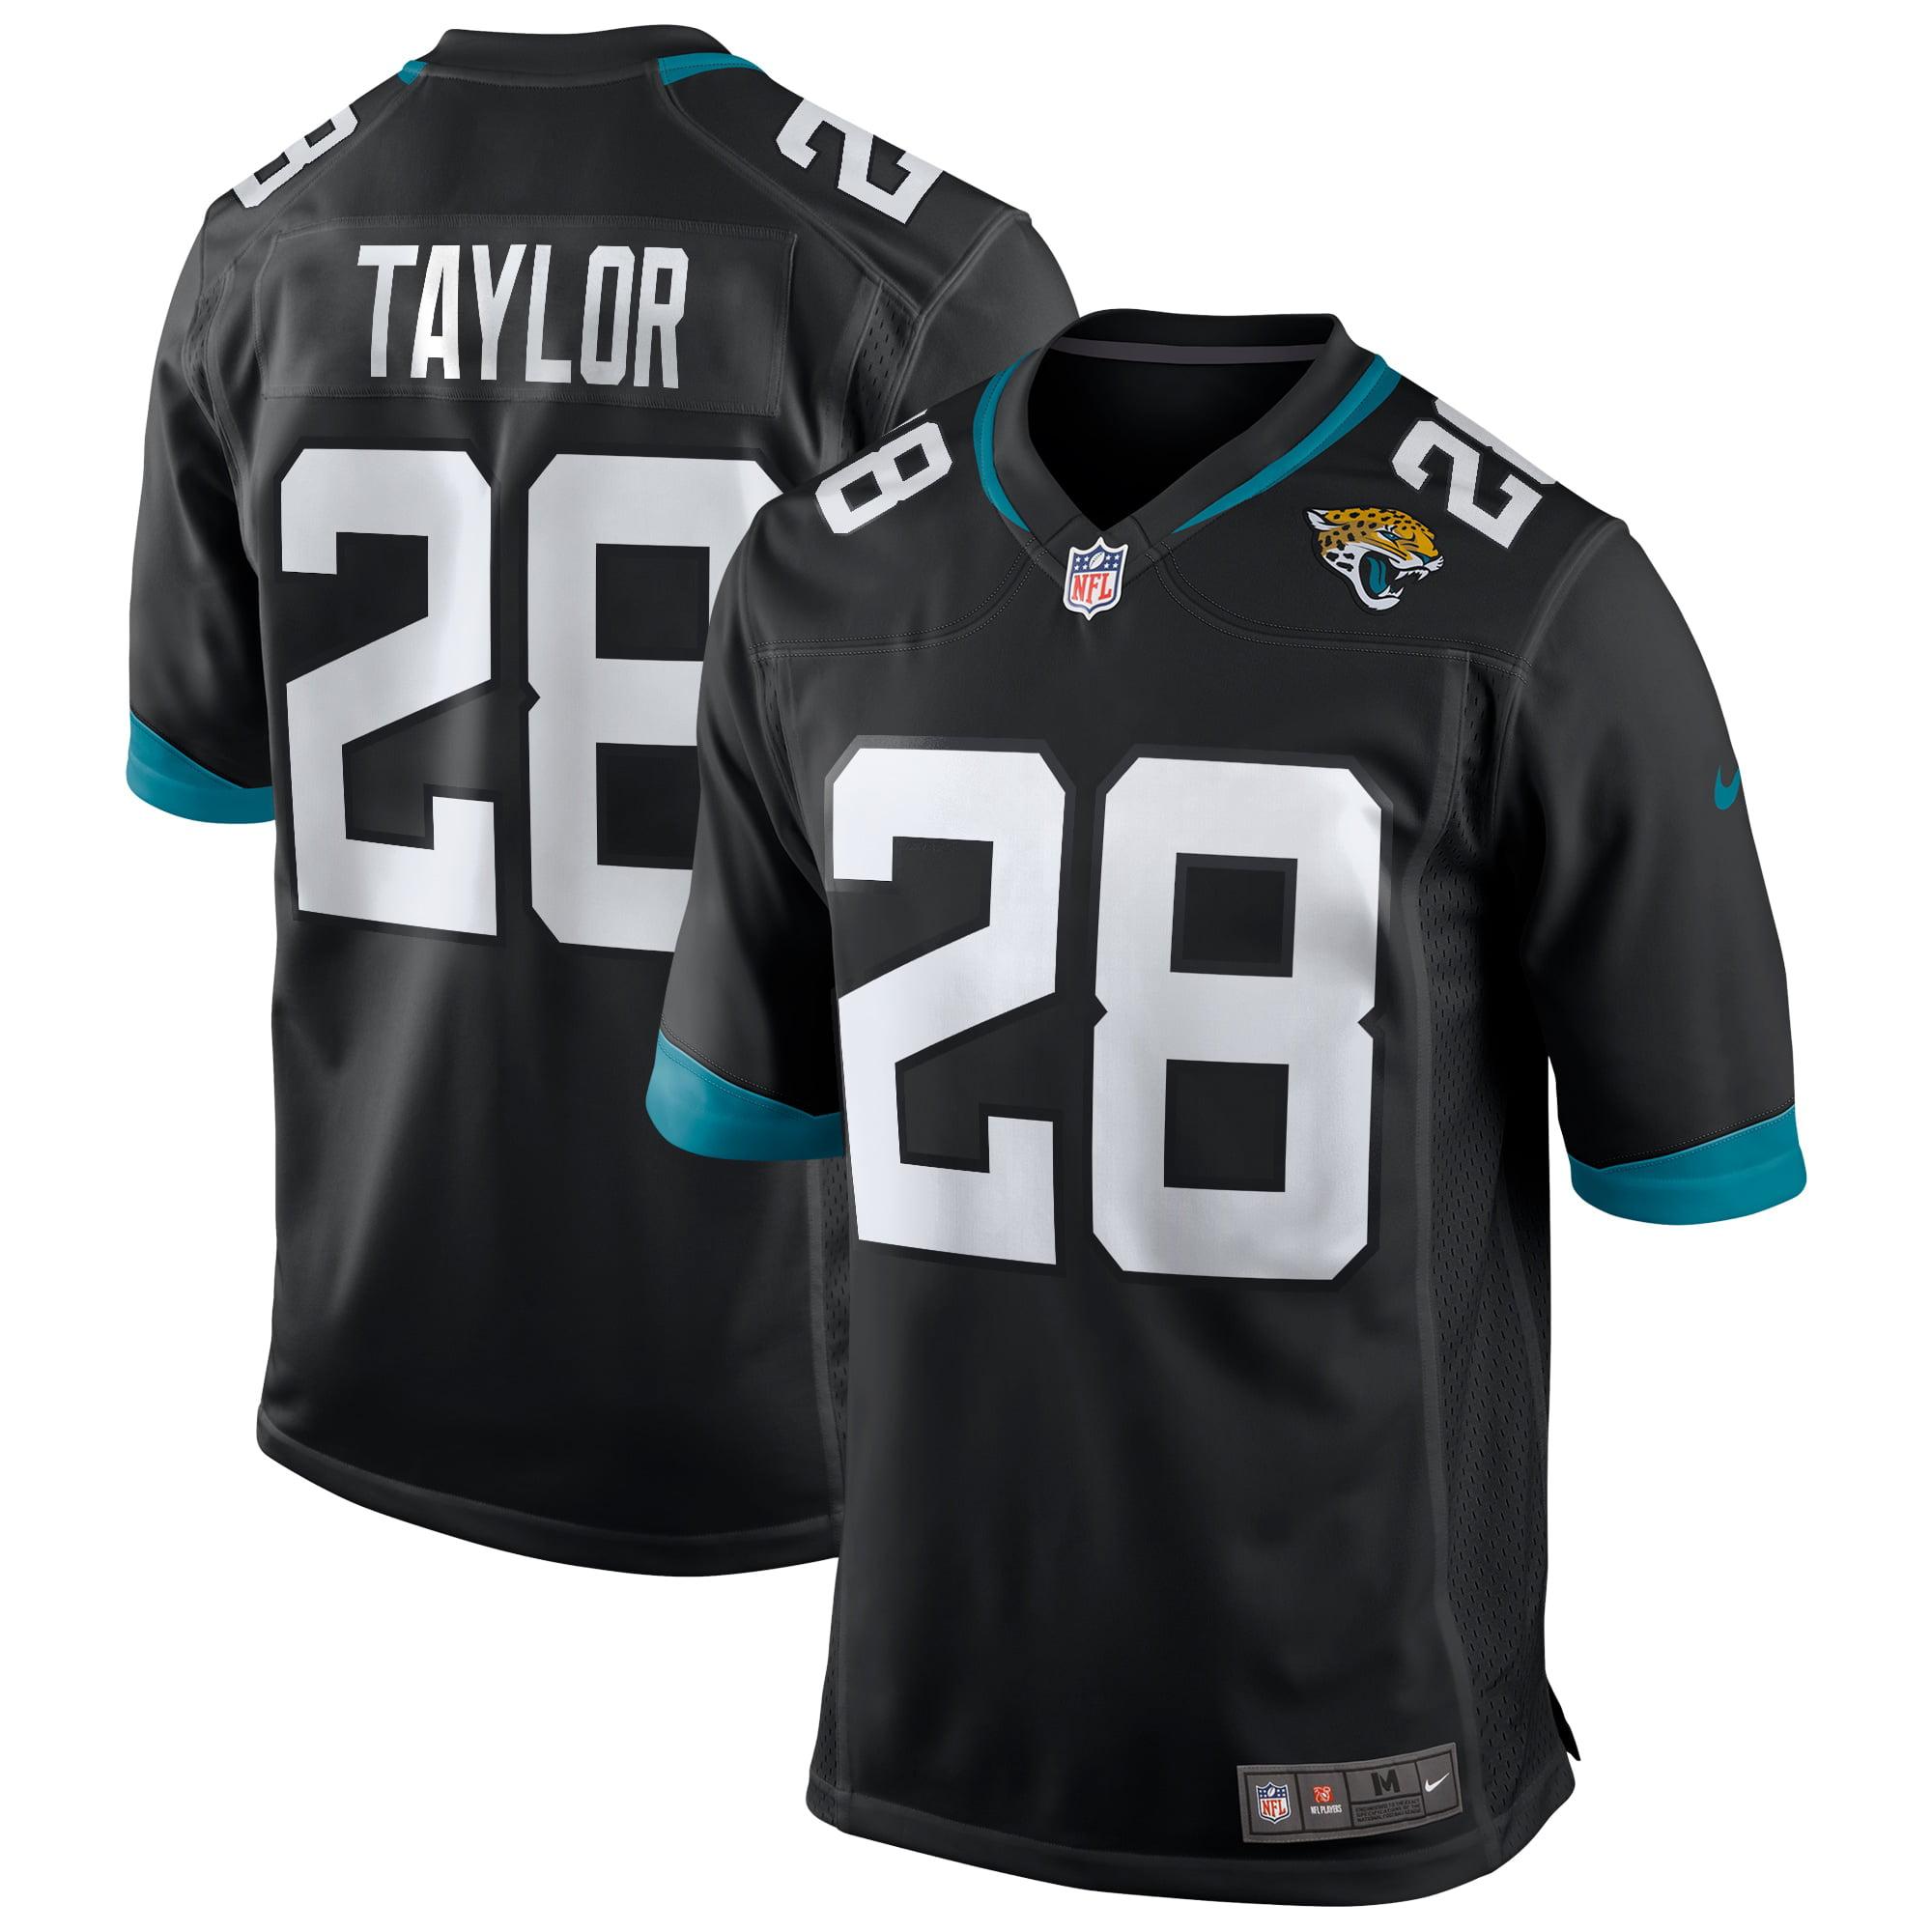 Fred Taylor Jacksonville Jaguars Nike Game Retired Player Jersey - Black